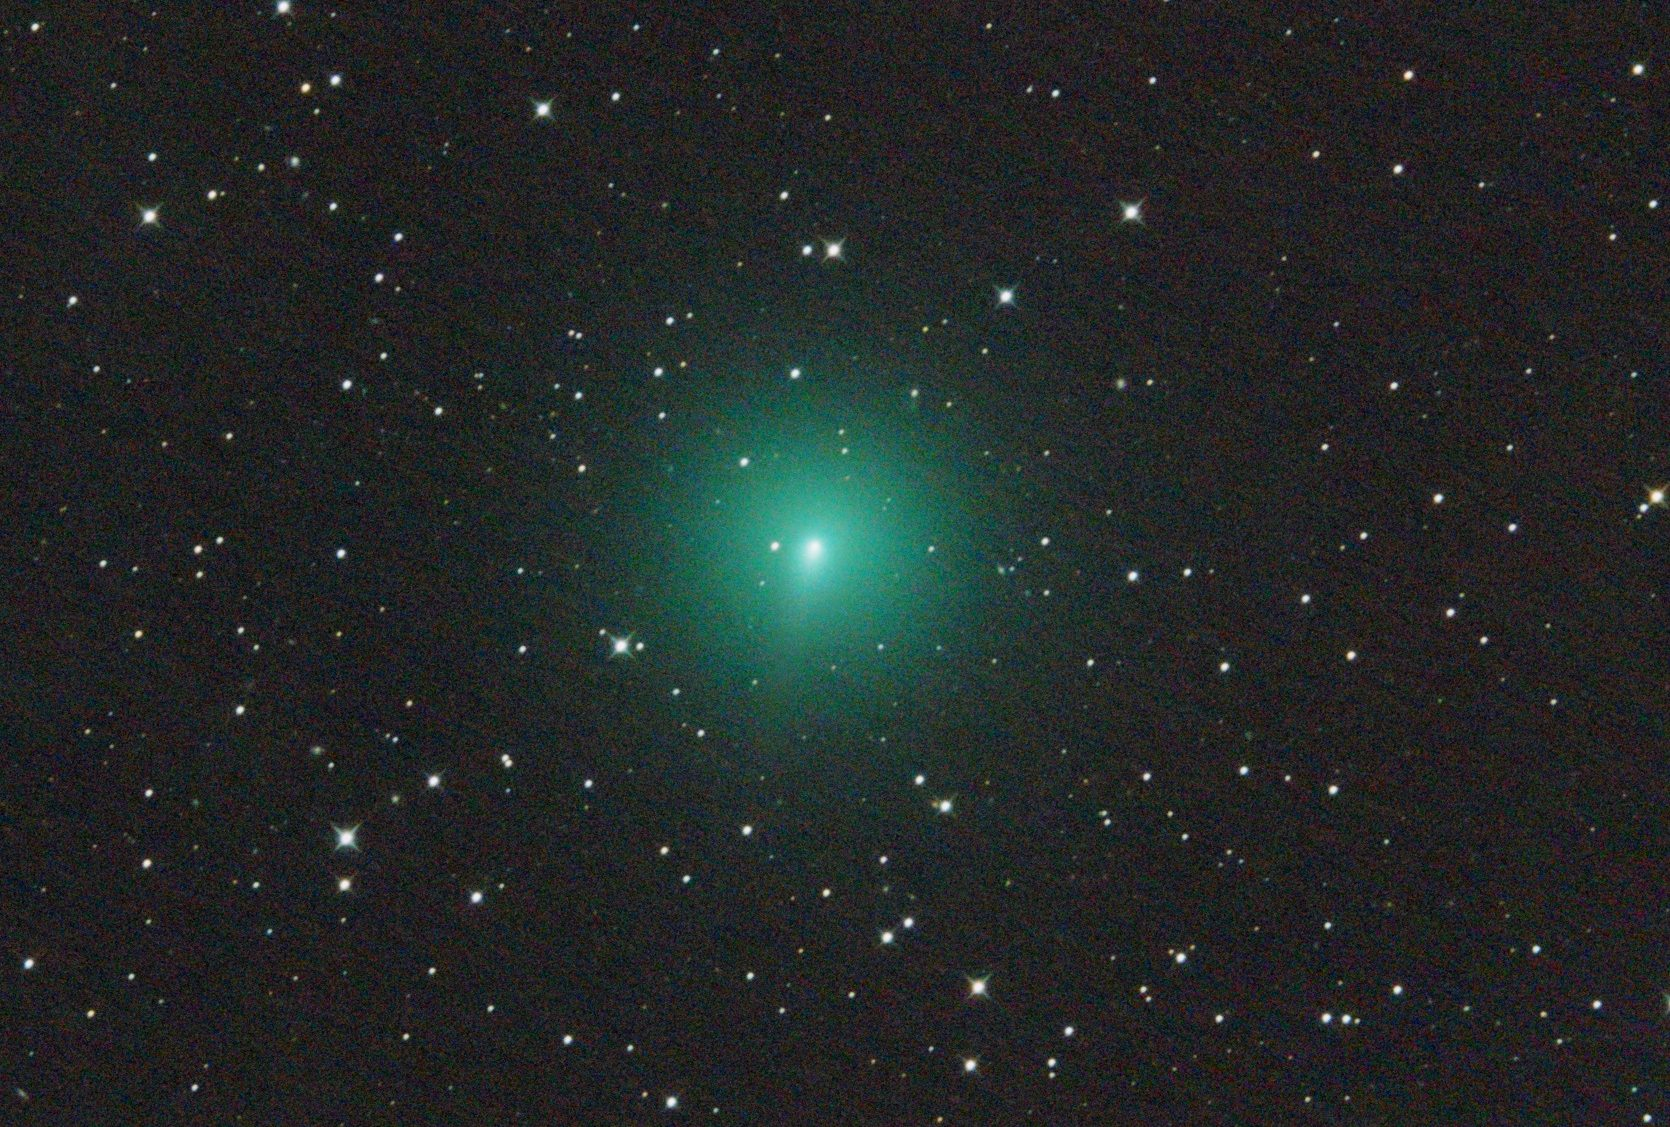 La cometa Atlas nel cielo di Aprile